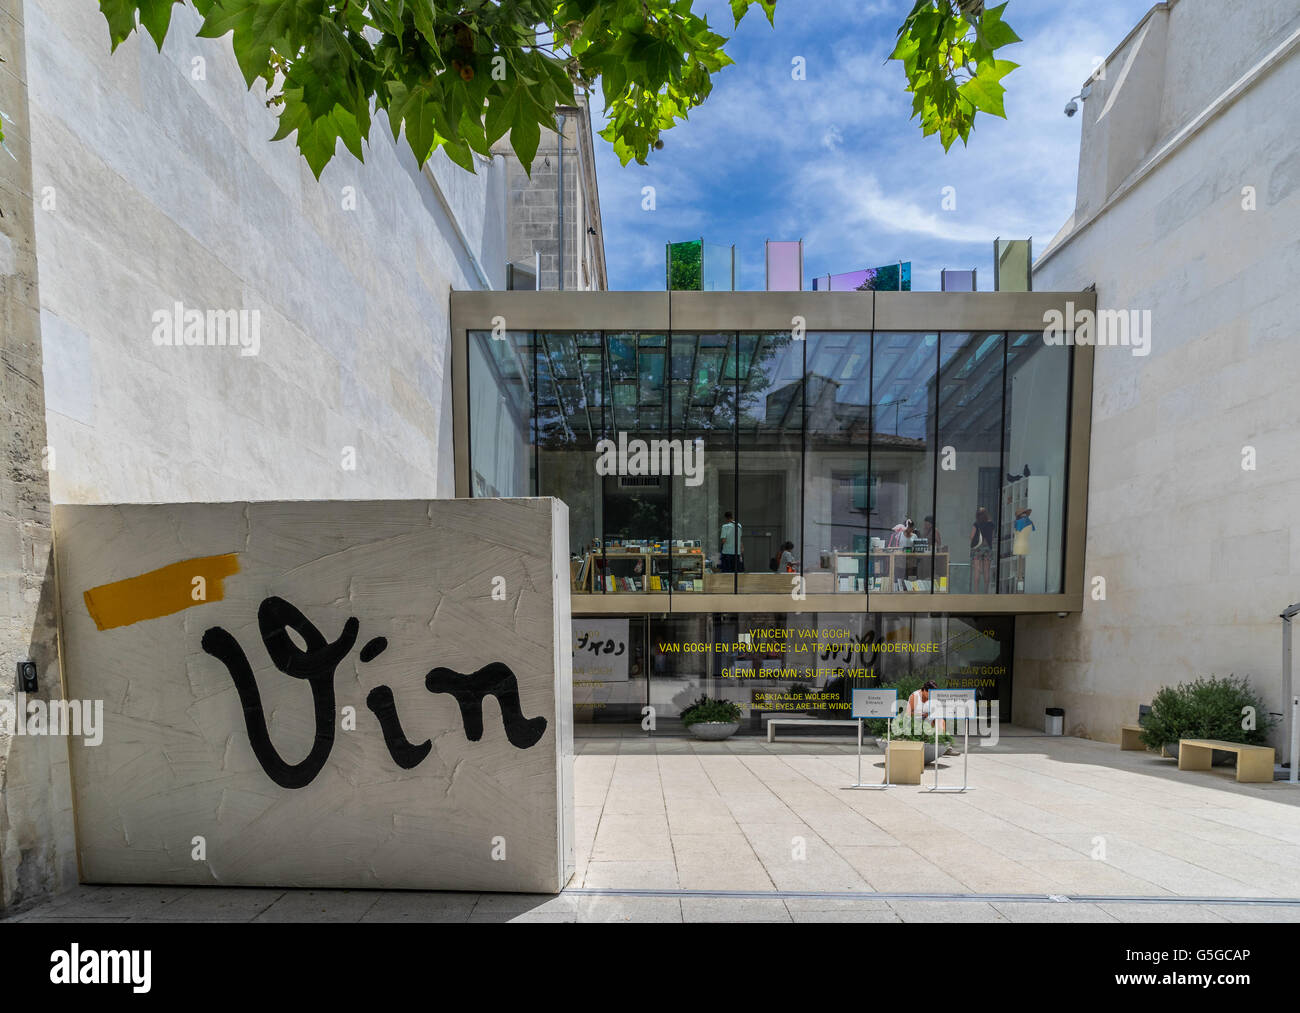 Vincent van Gogh museum in Arles - Stock Image